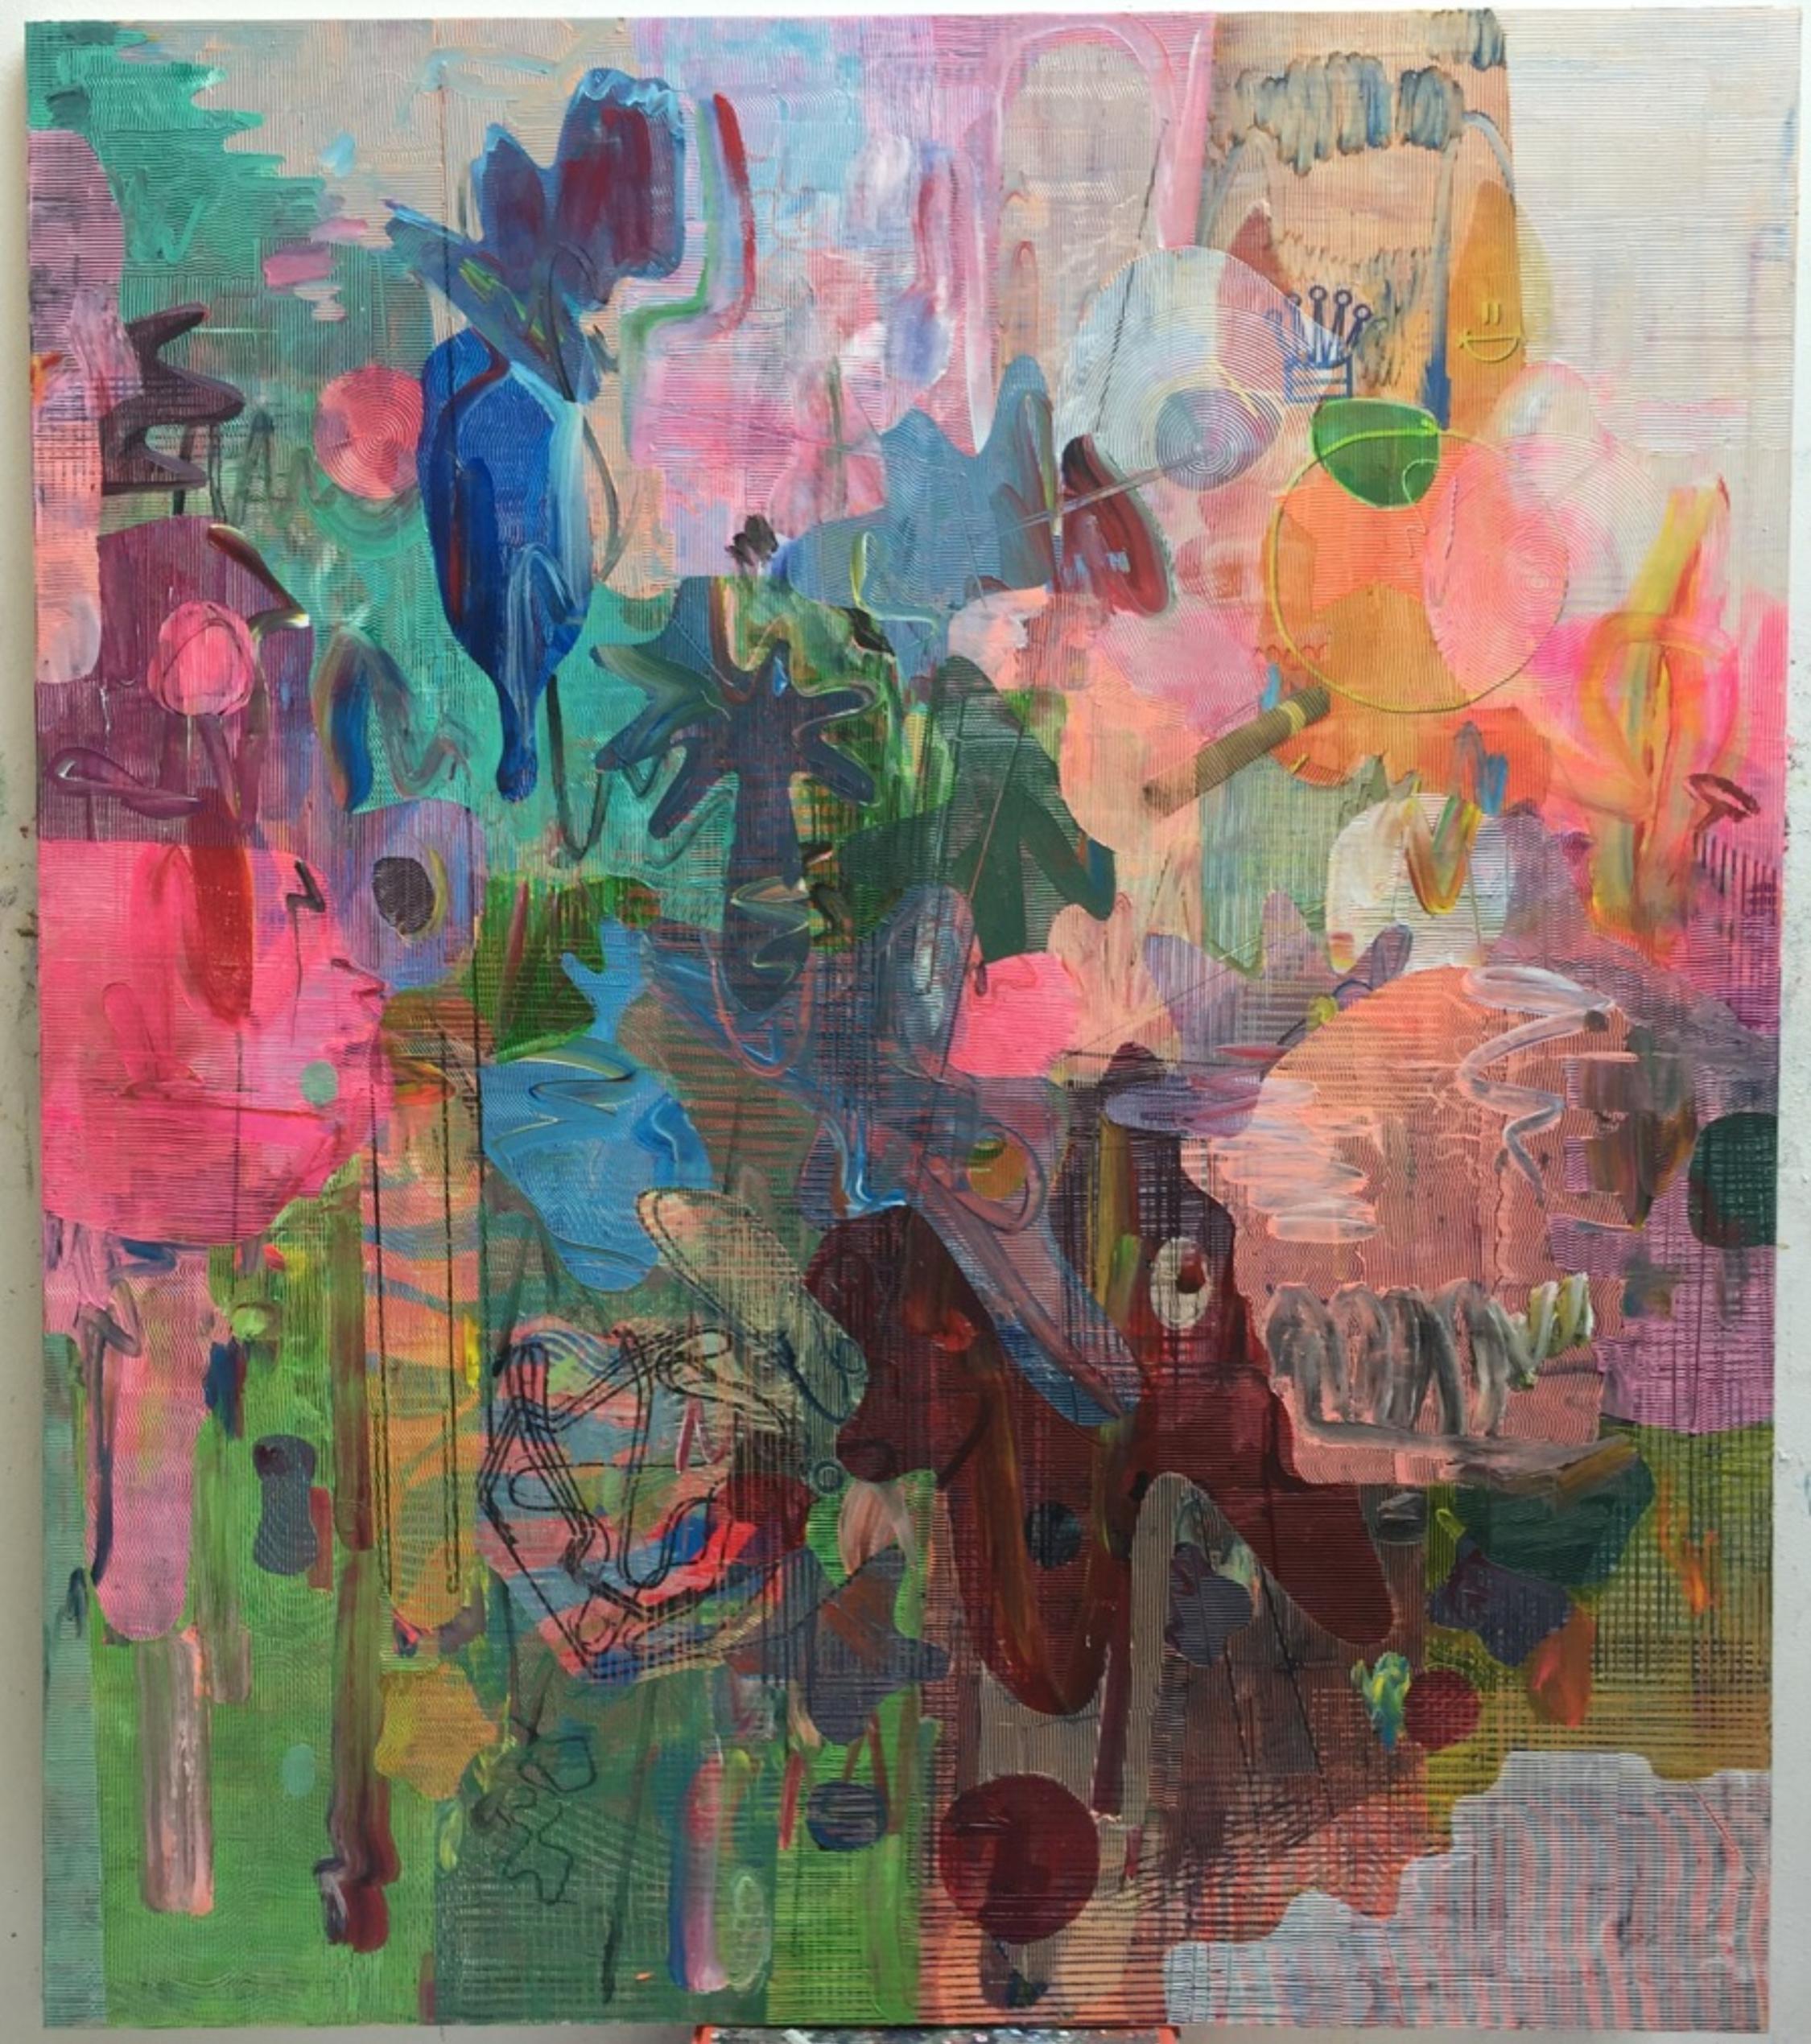 """Untitled"" 230 x 200 cm. Acrílico, sobre papel sobre tela, 2021"